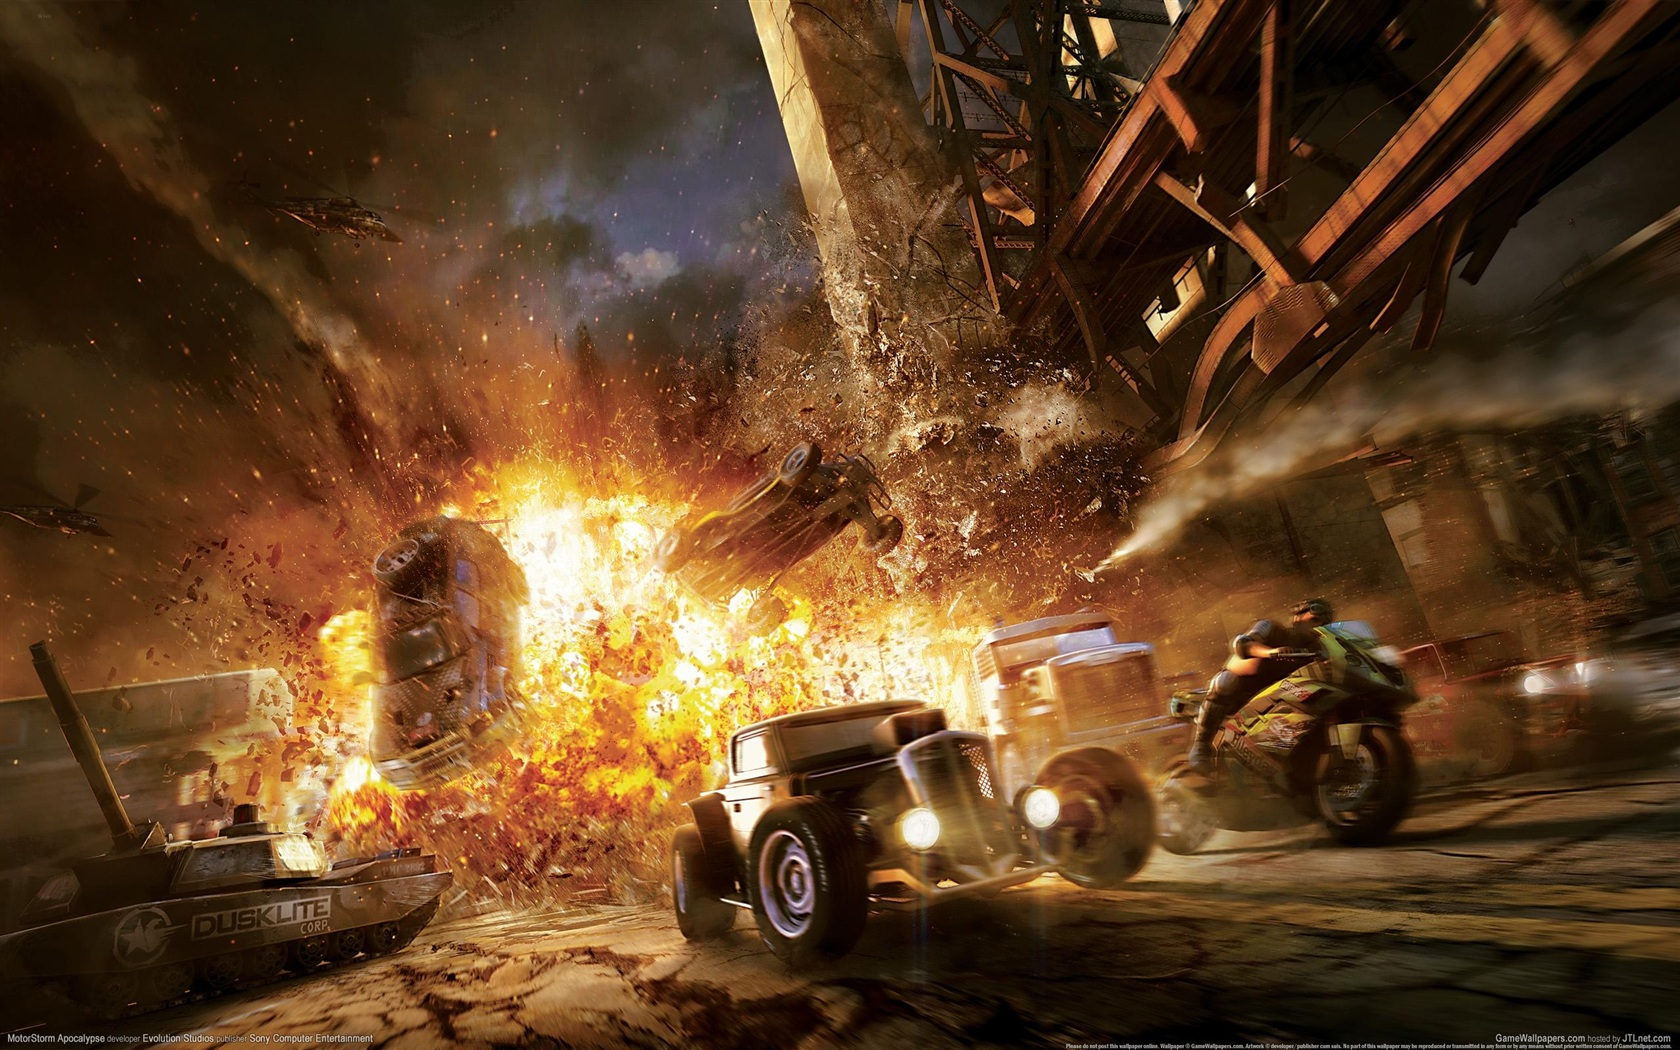 Vehicles War Vehicles Action Hd Military Images Fire: 壁紙 MotorStorm〜モーターストーム〜アポカリプス 2560x1600 HD 無料のデスクトップの背景, 画像